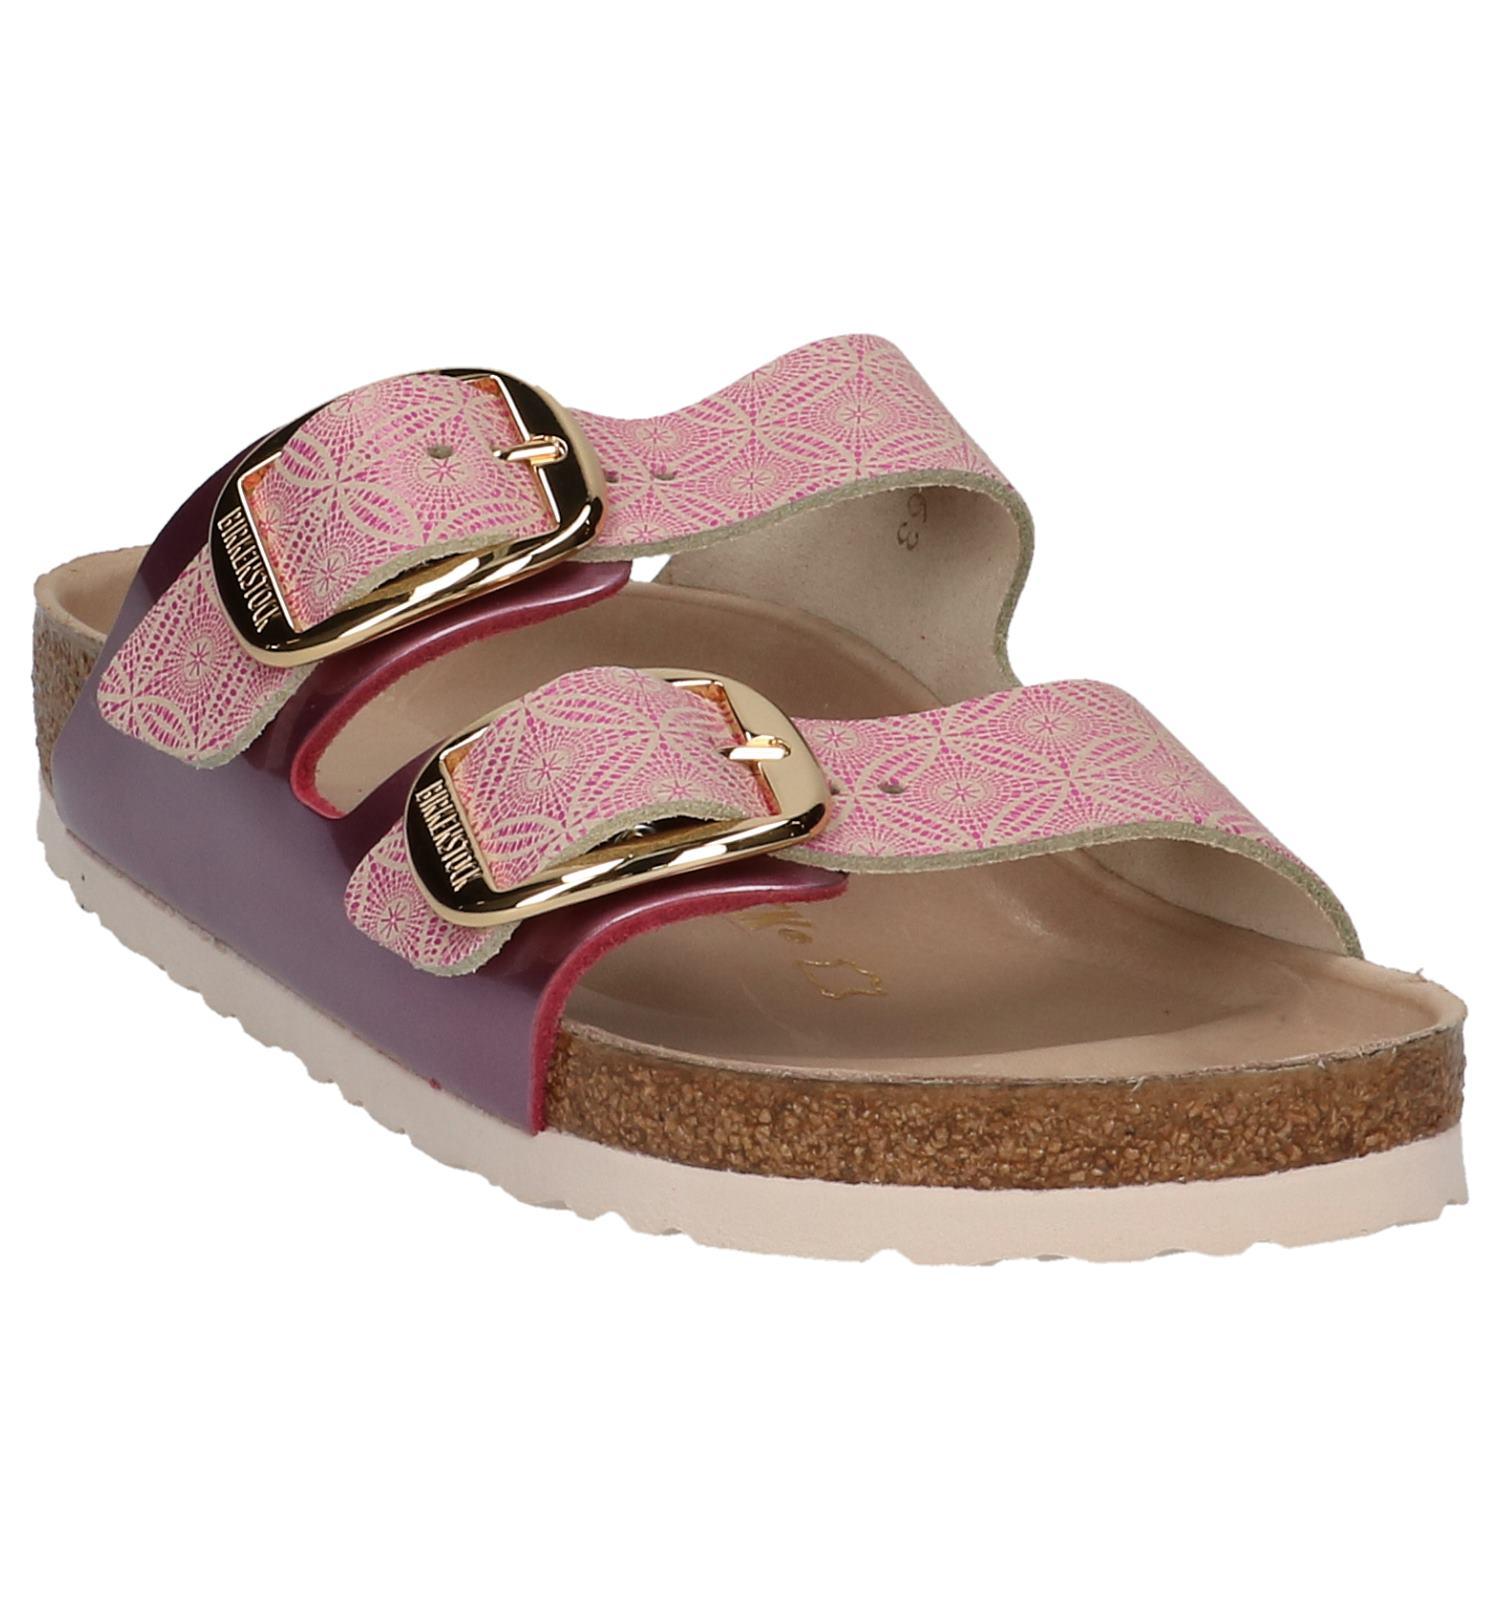 Birkenstock Roze Arizona Slippers Buckle Big wkPZ8nON0X